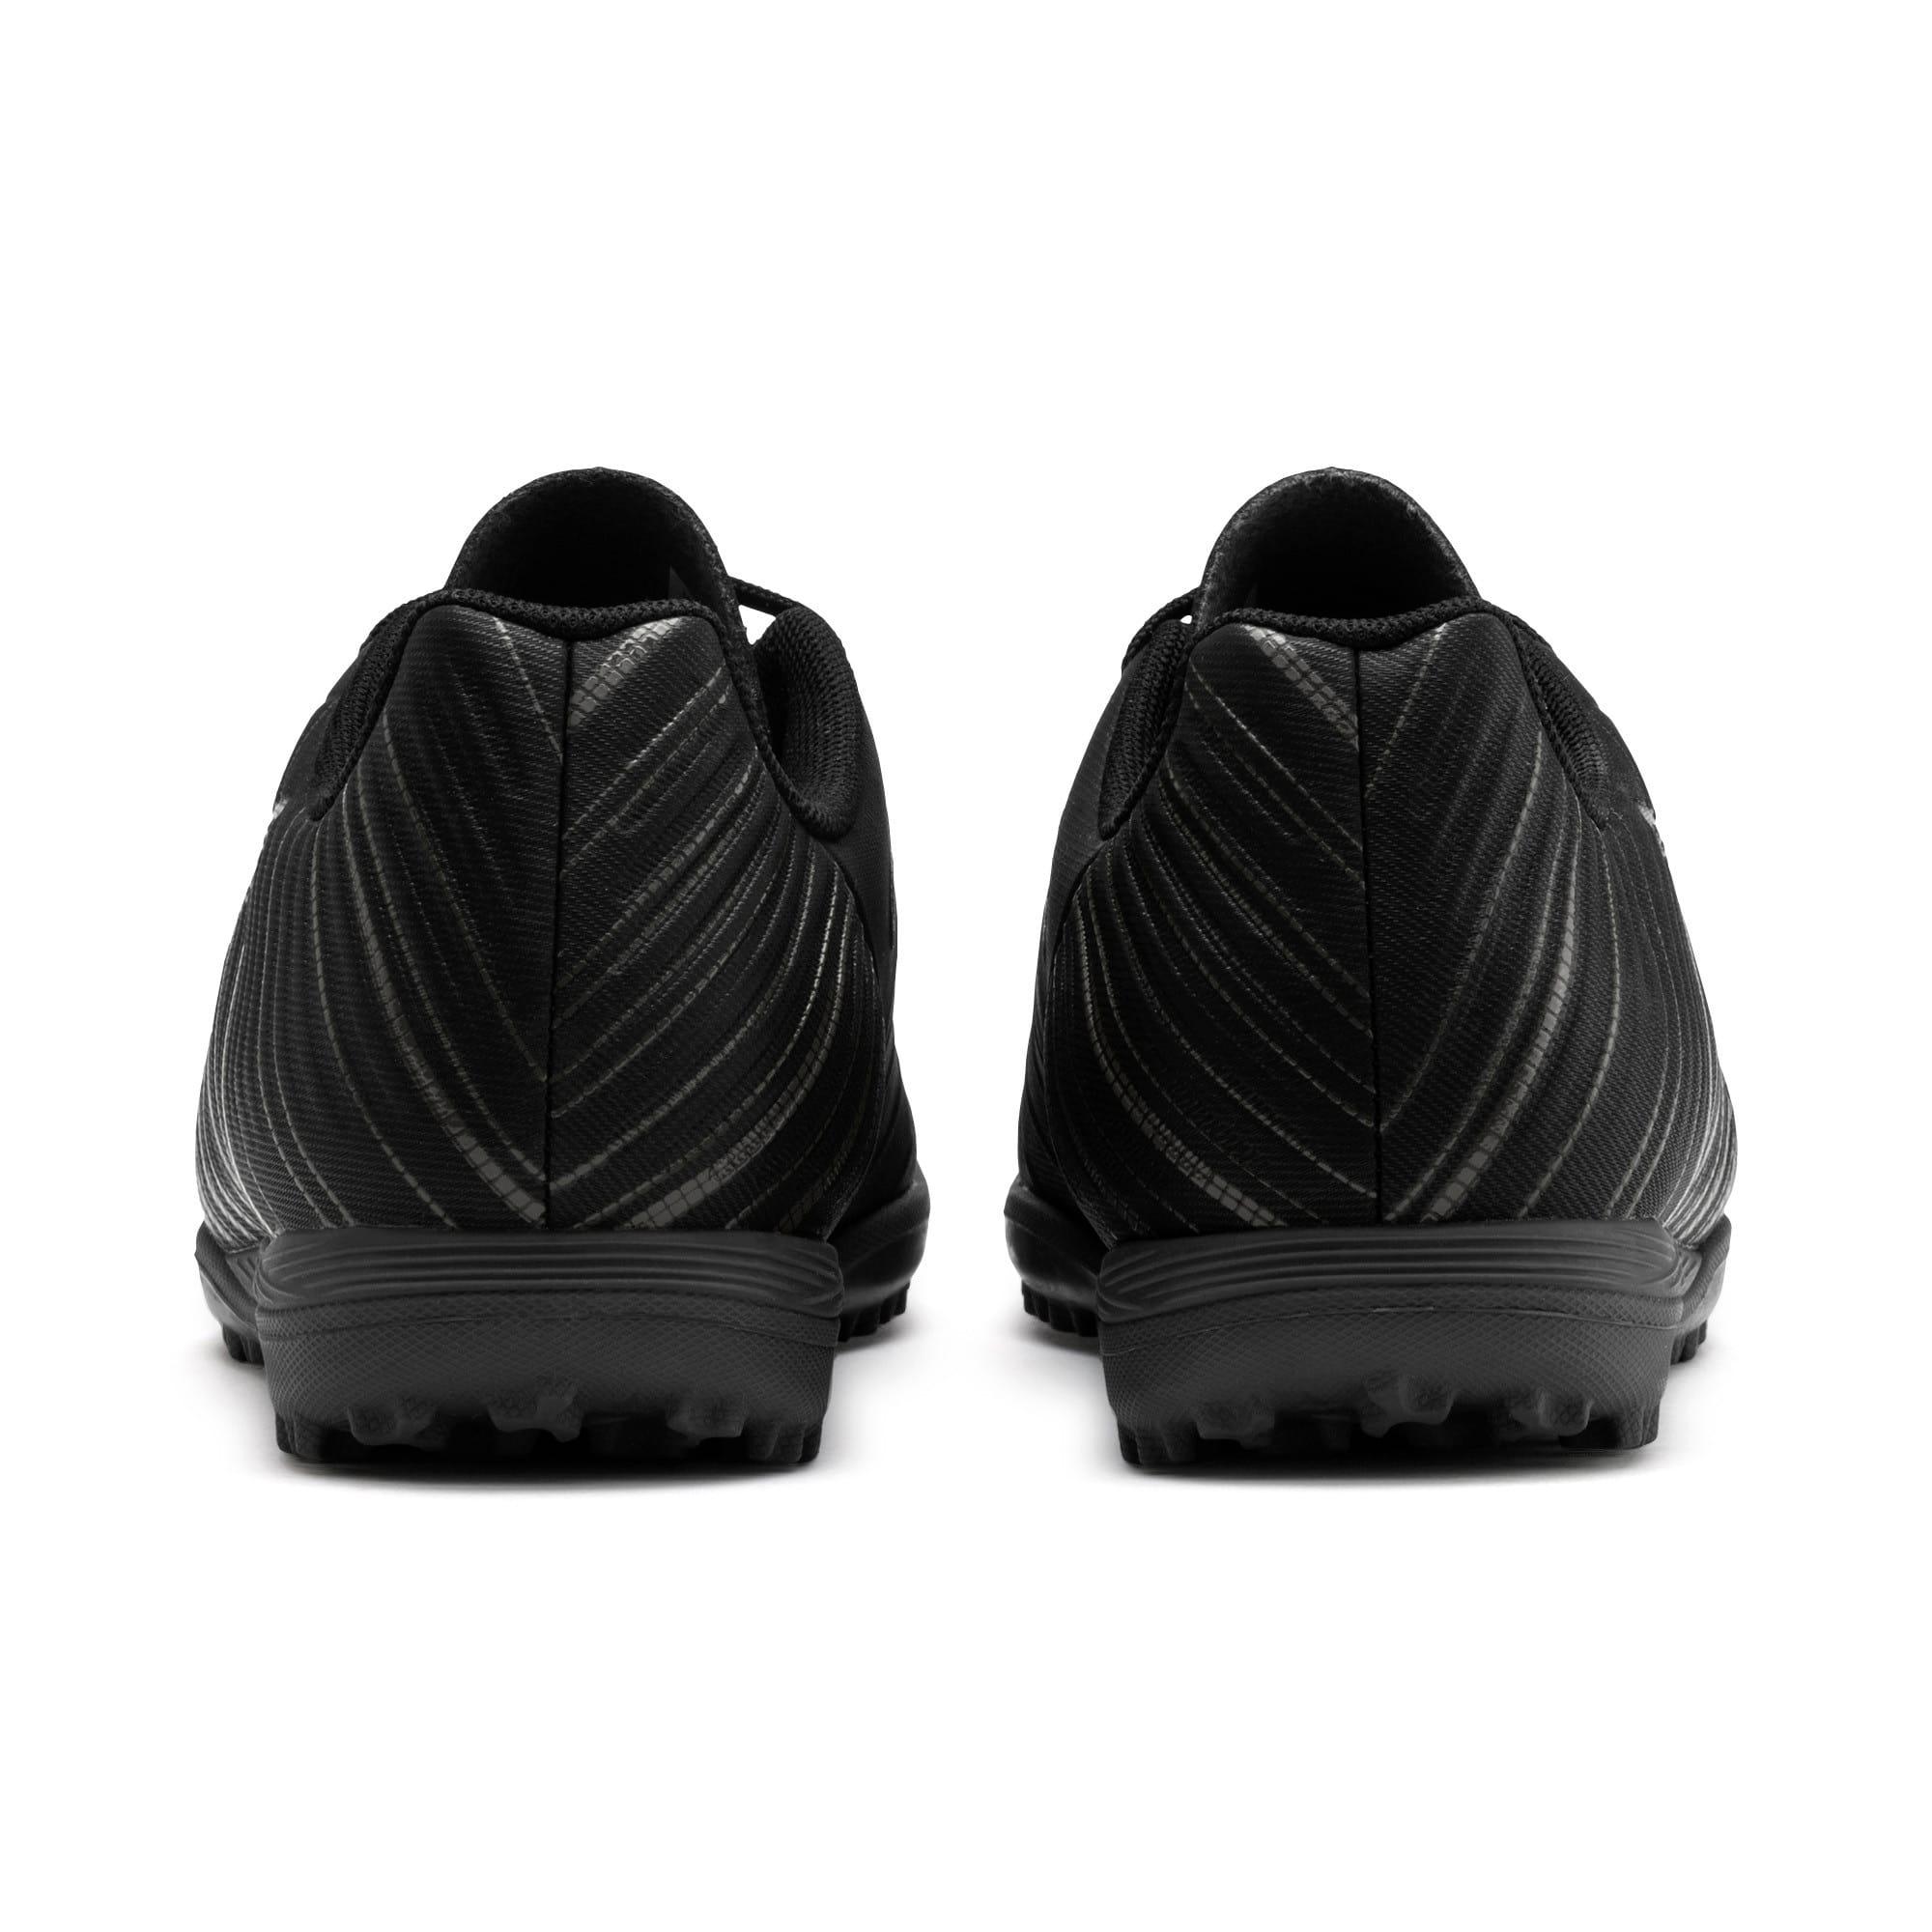 Thumbnail 3 of PUMA ONE 5.4 TT Soccer Shoes JR, Black-Black-Puma Aged Silver, medium